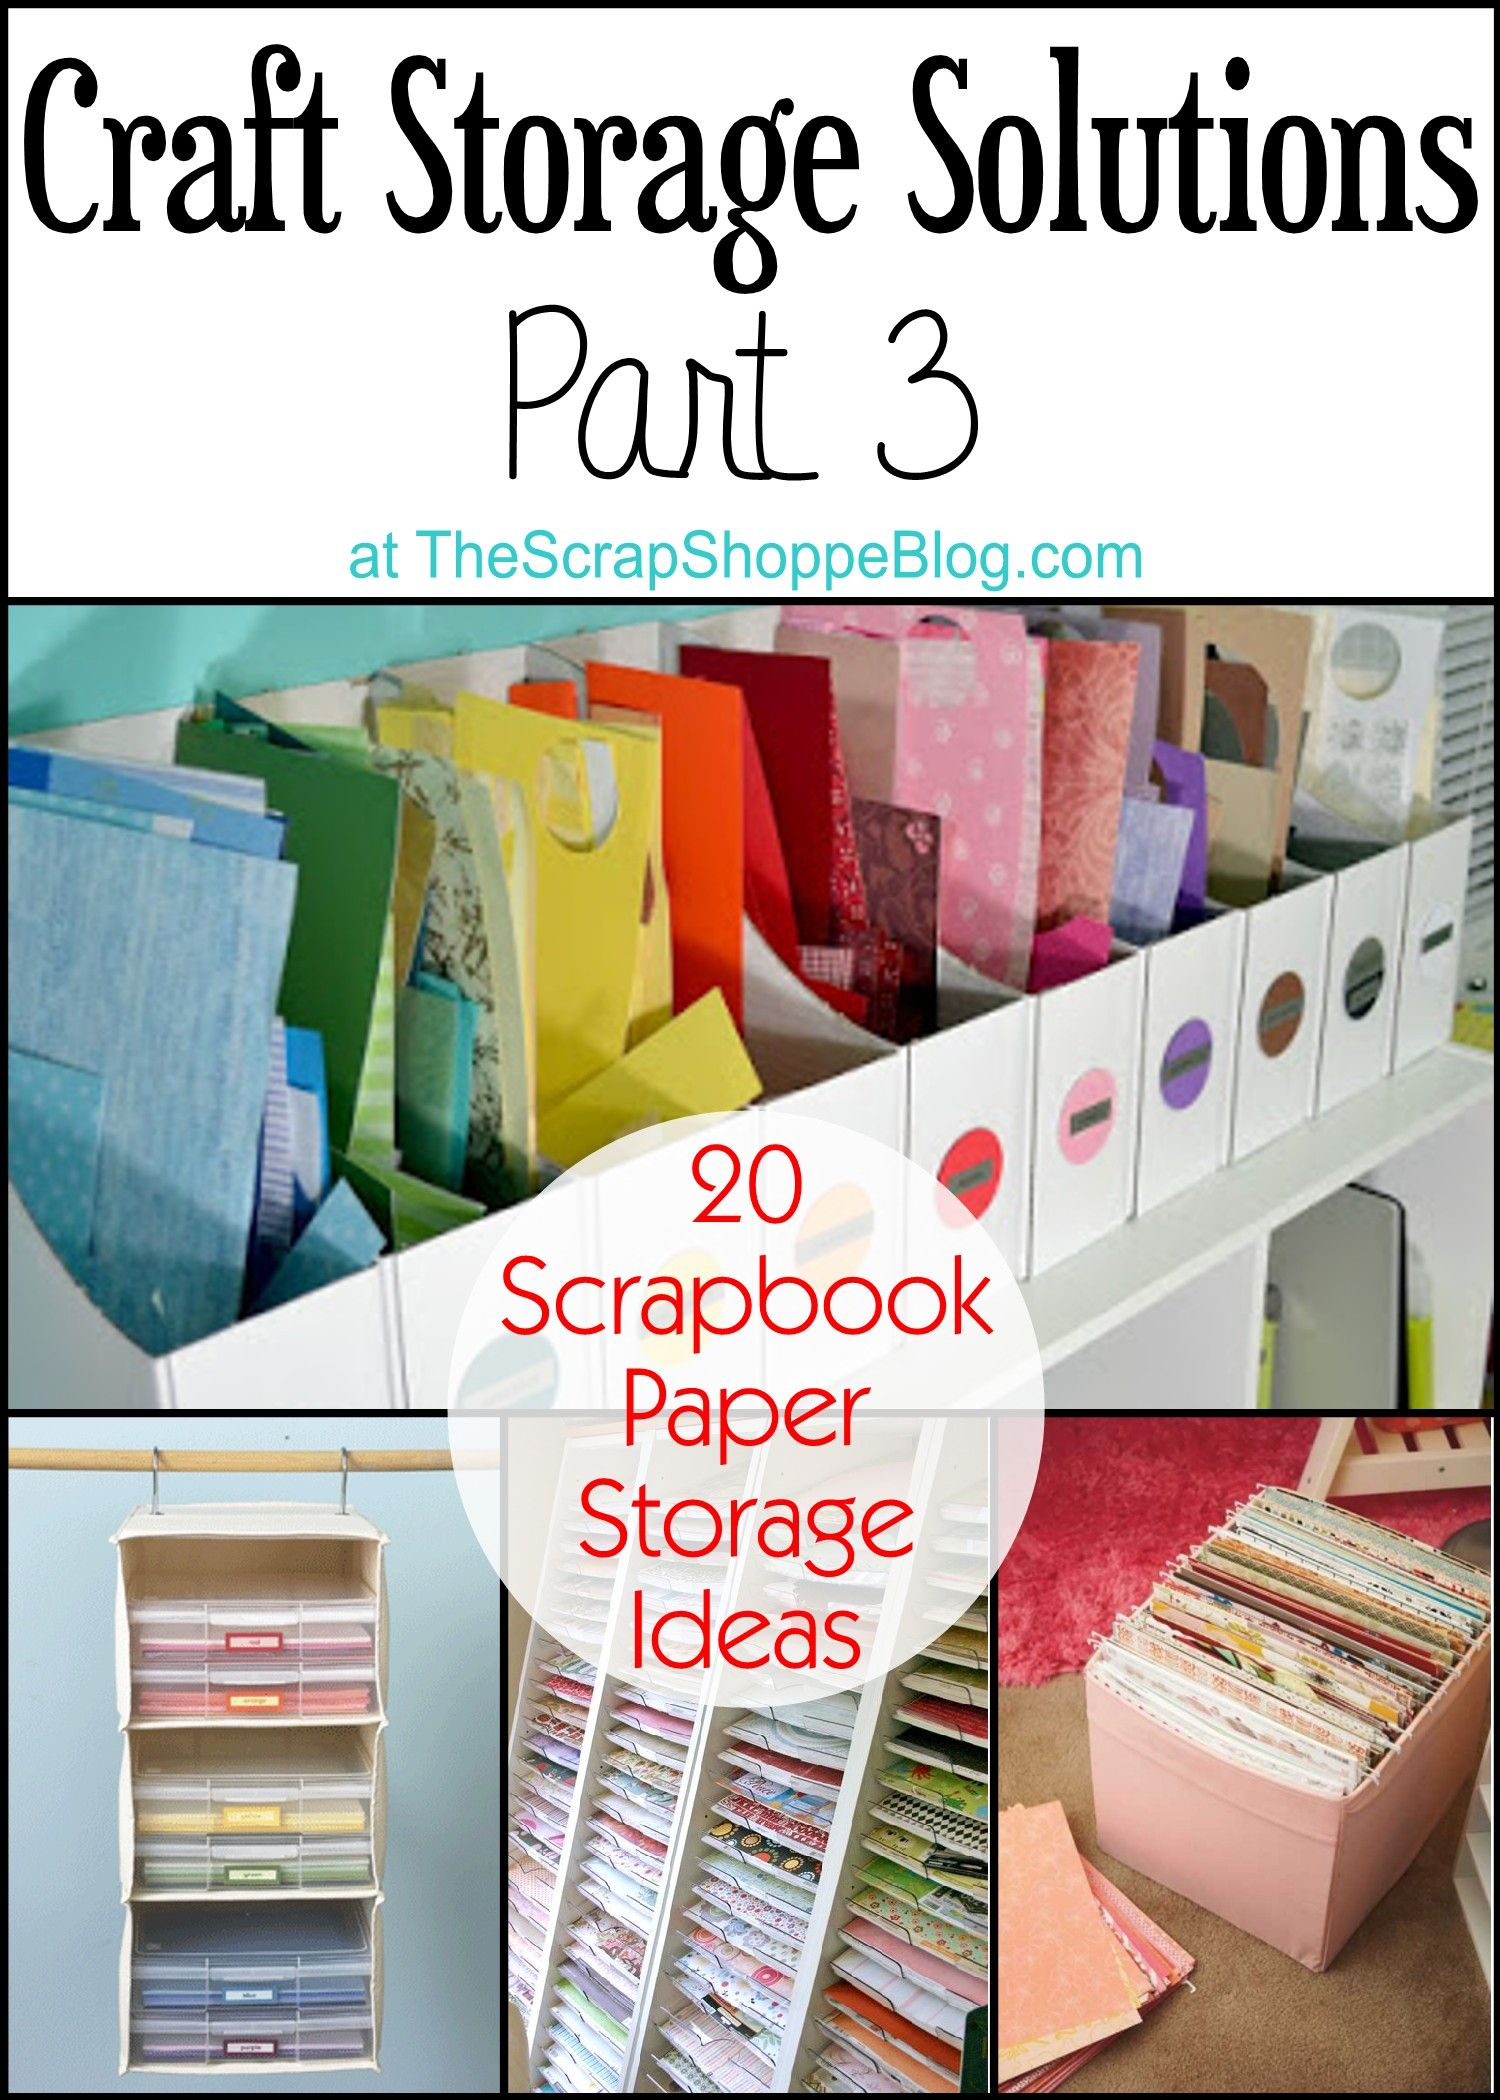 20 scrapbook paper storage solutions part 3 of craft for Storage solutions for craft rooms